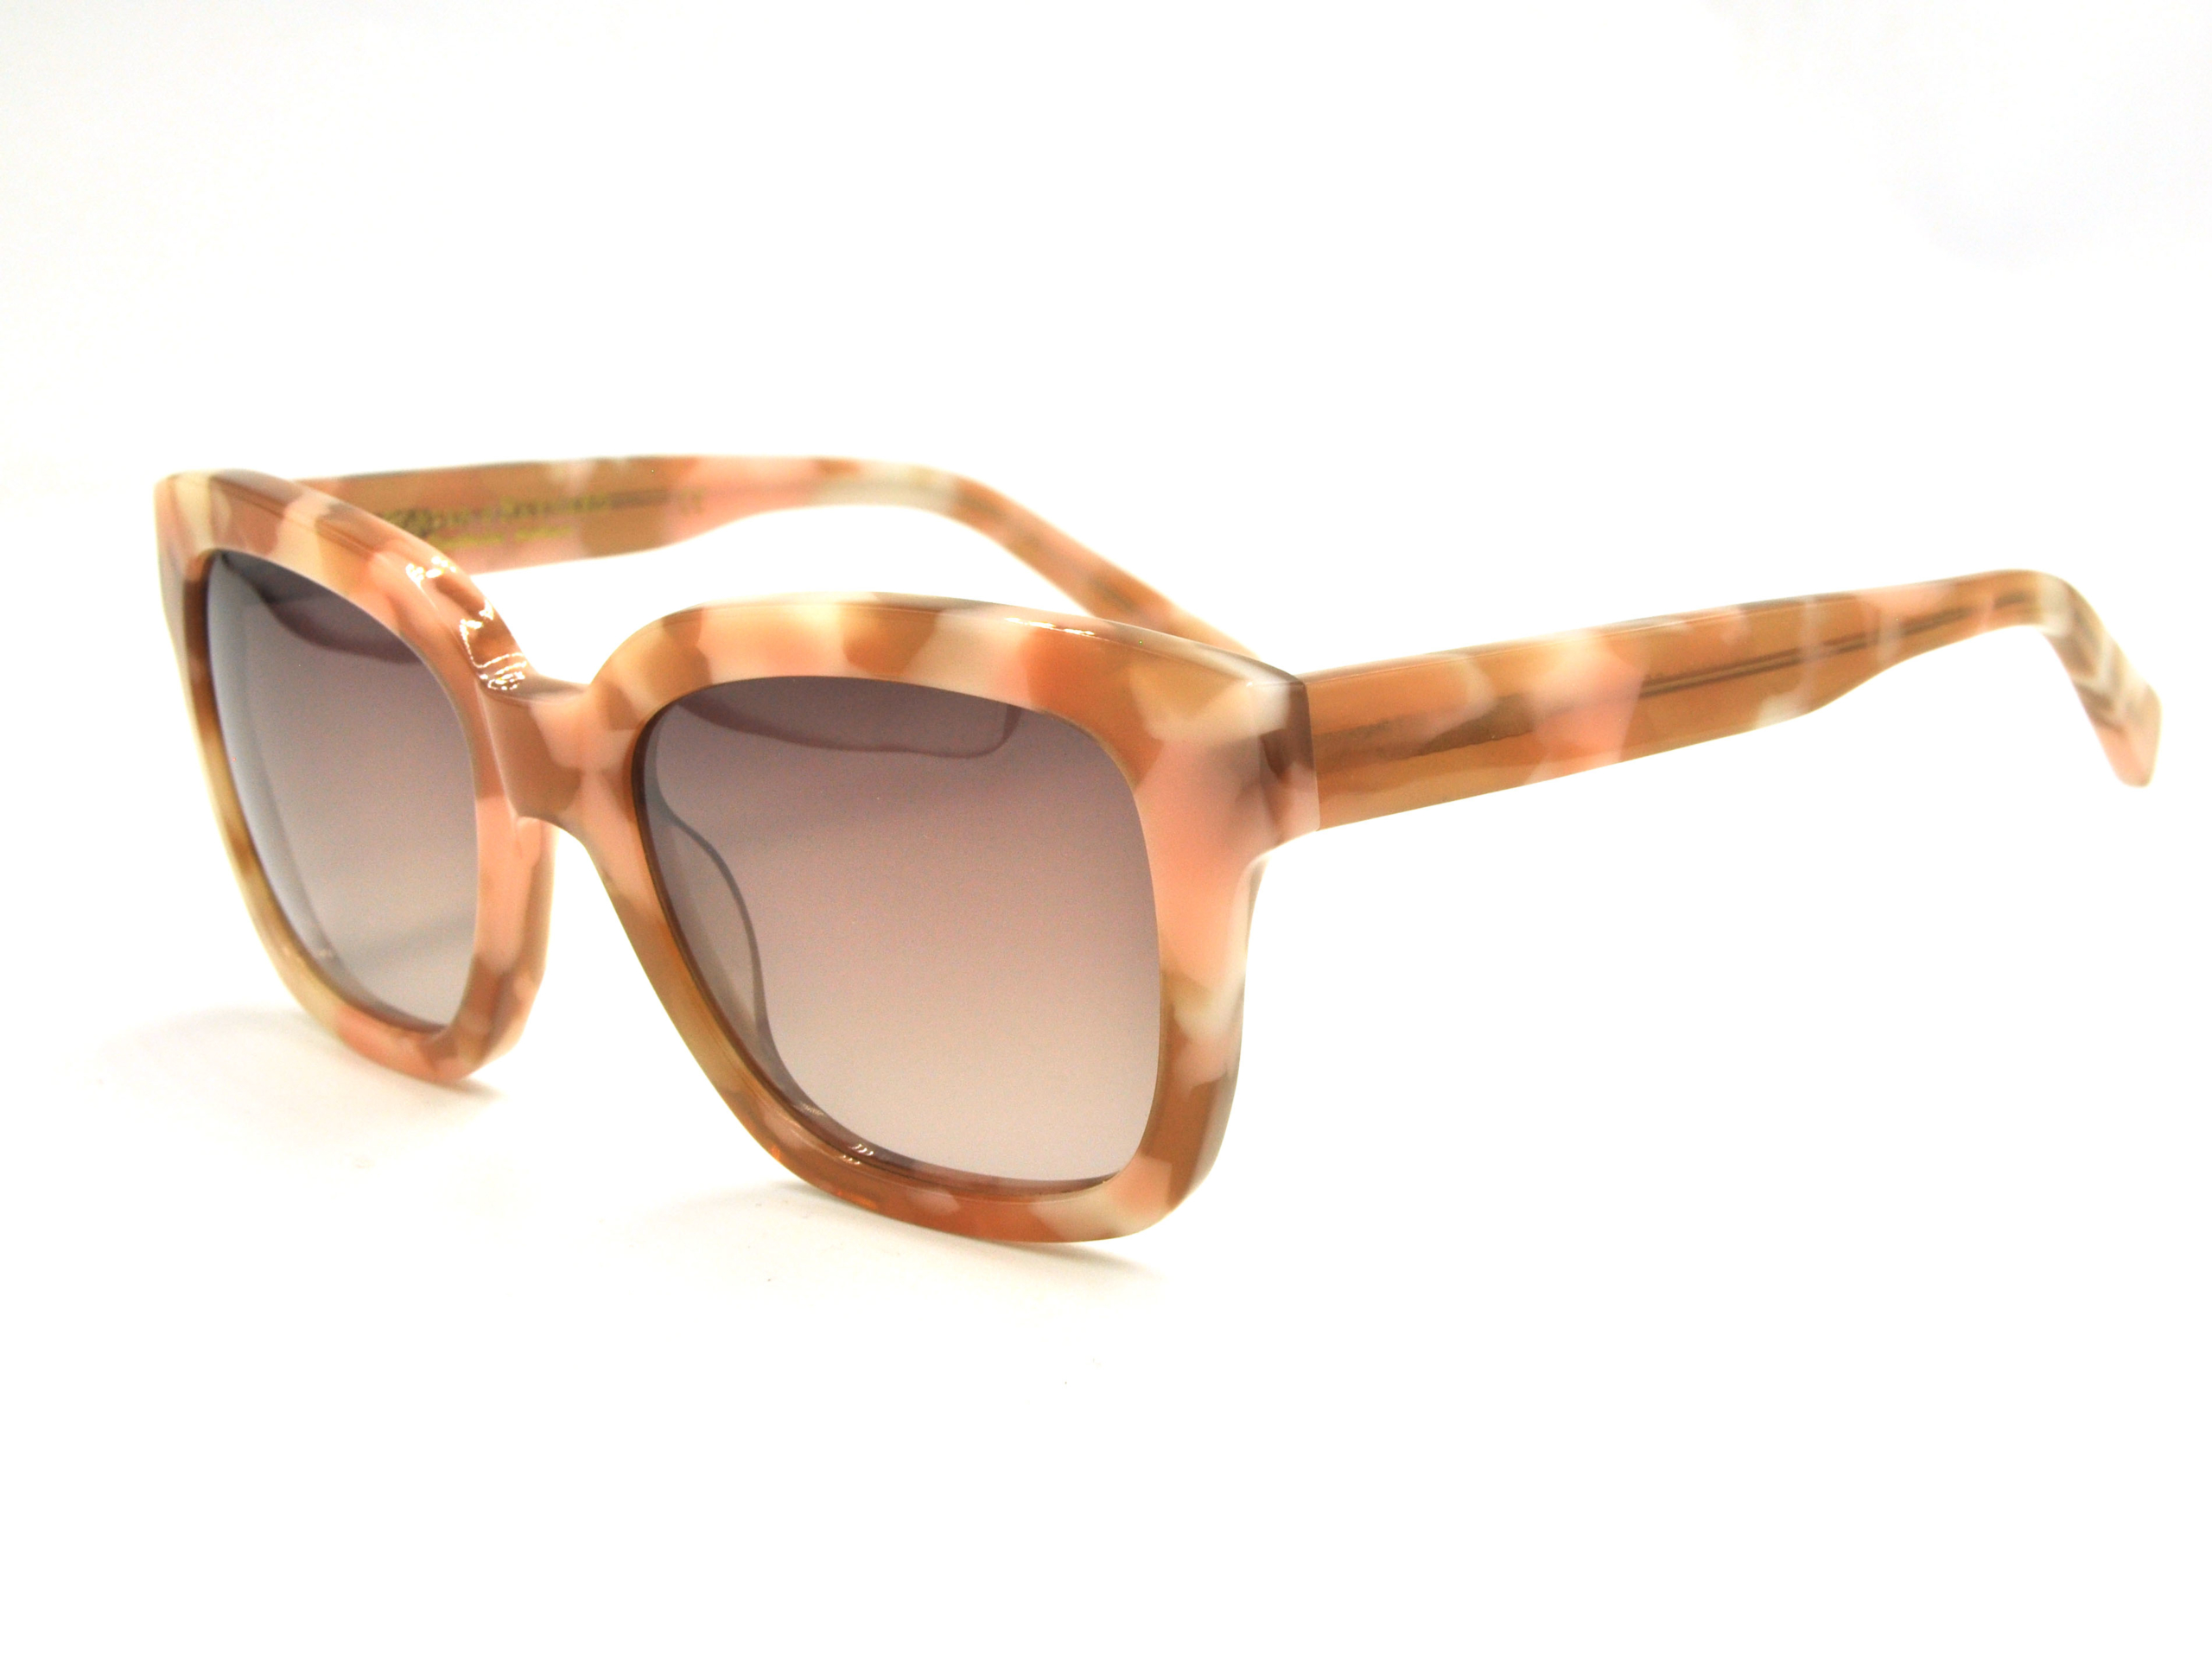 PORTER & REYNARD RACHEL C5 Sunglasses 2020